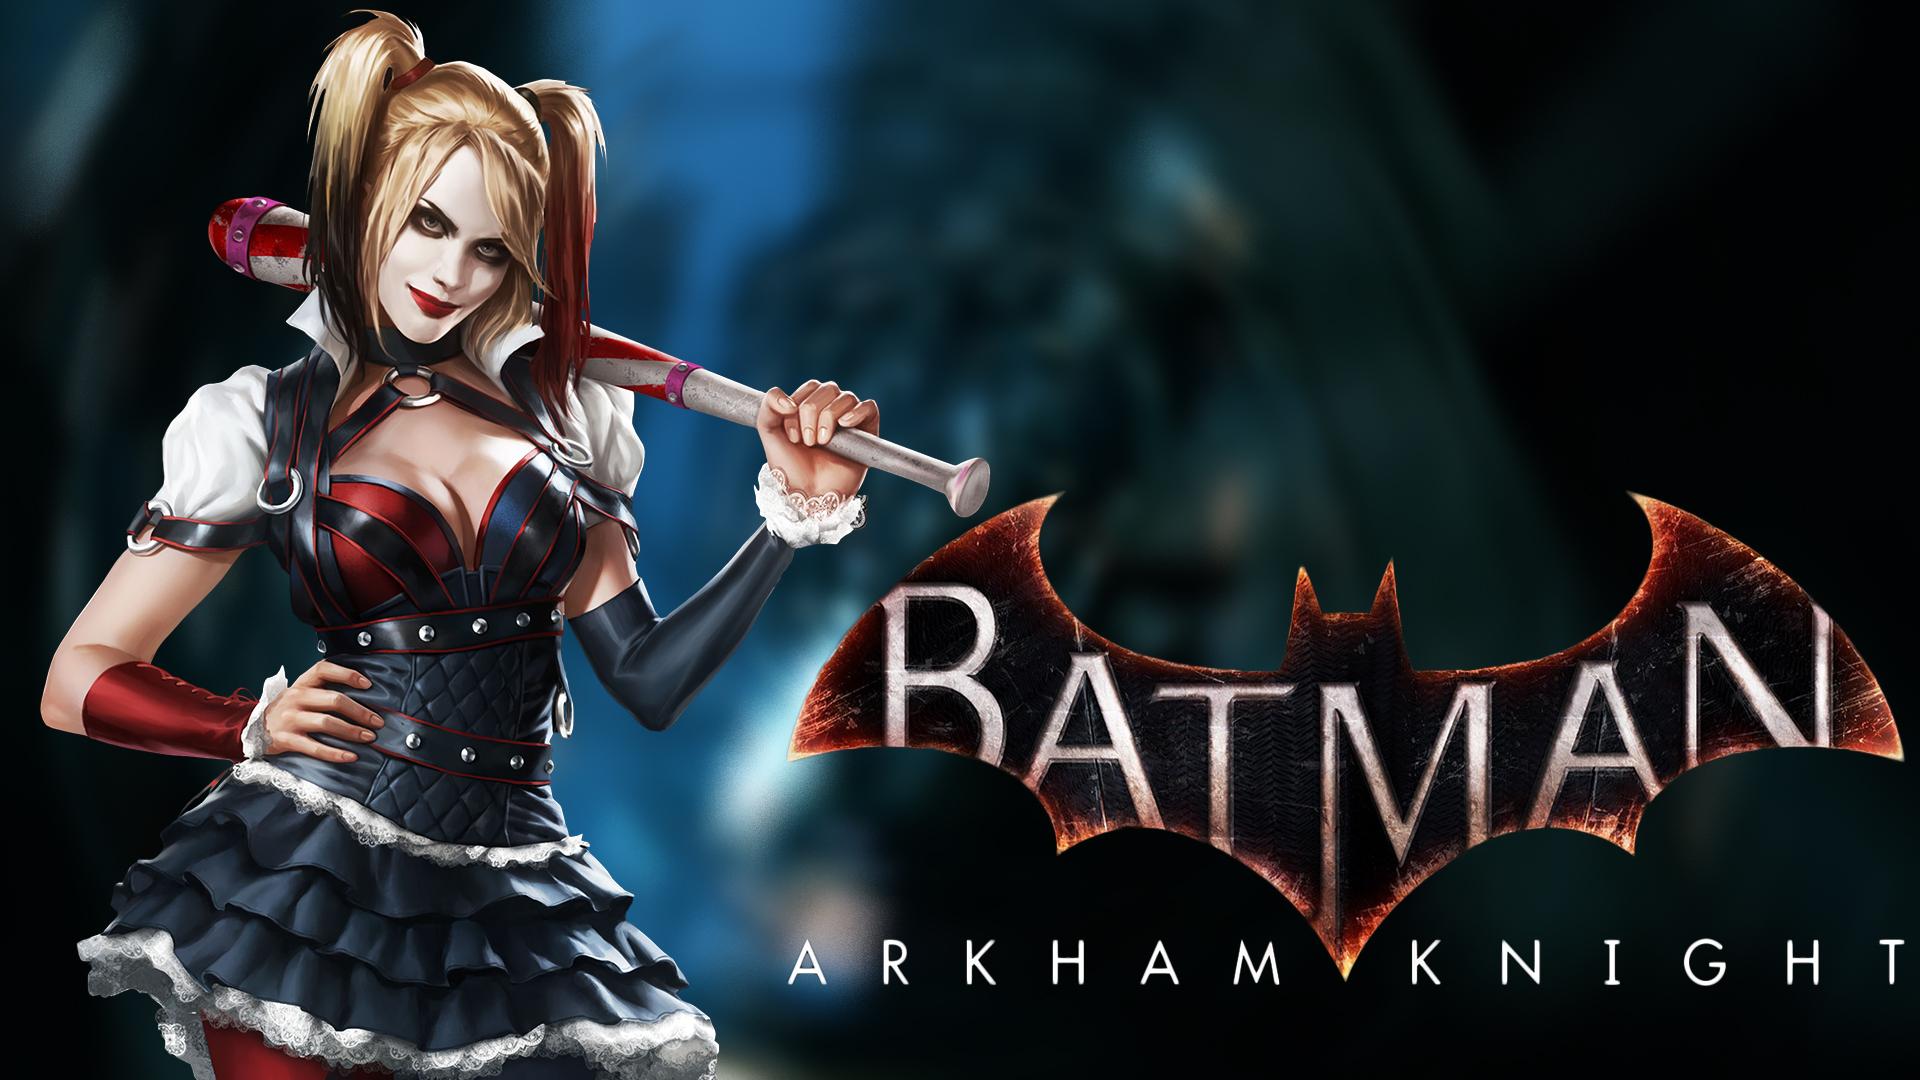 Batman: Arkham Knight – Harley Quinn Trailer Debuts